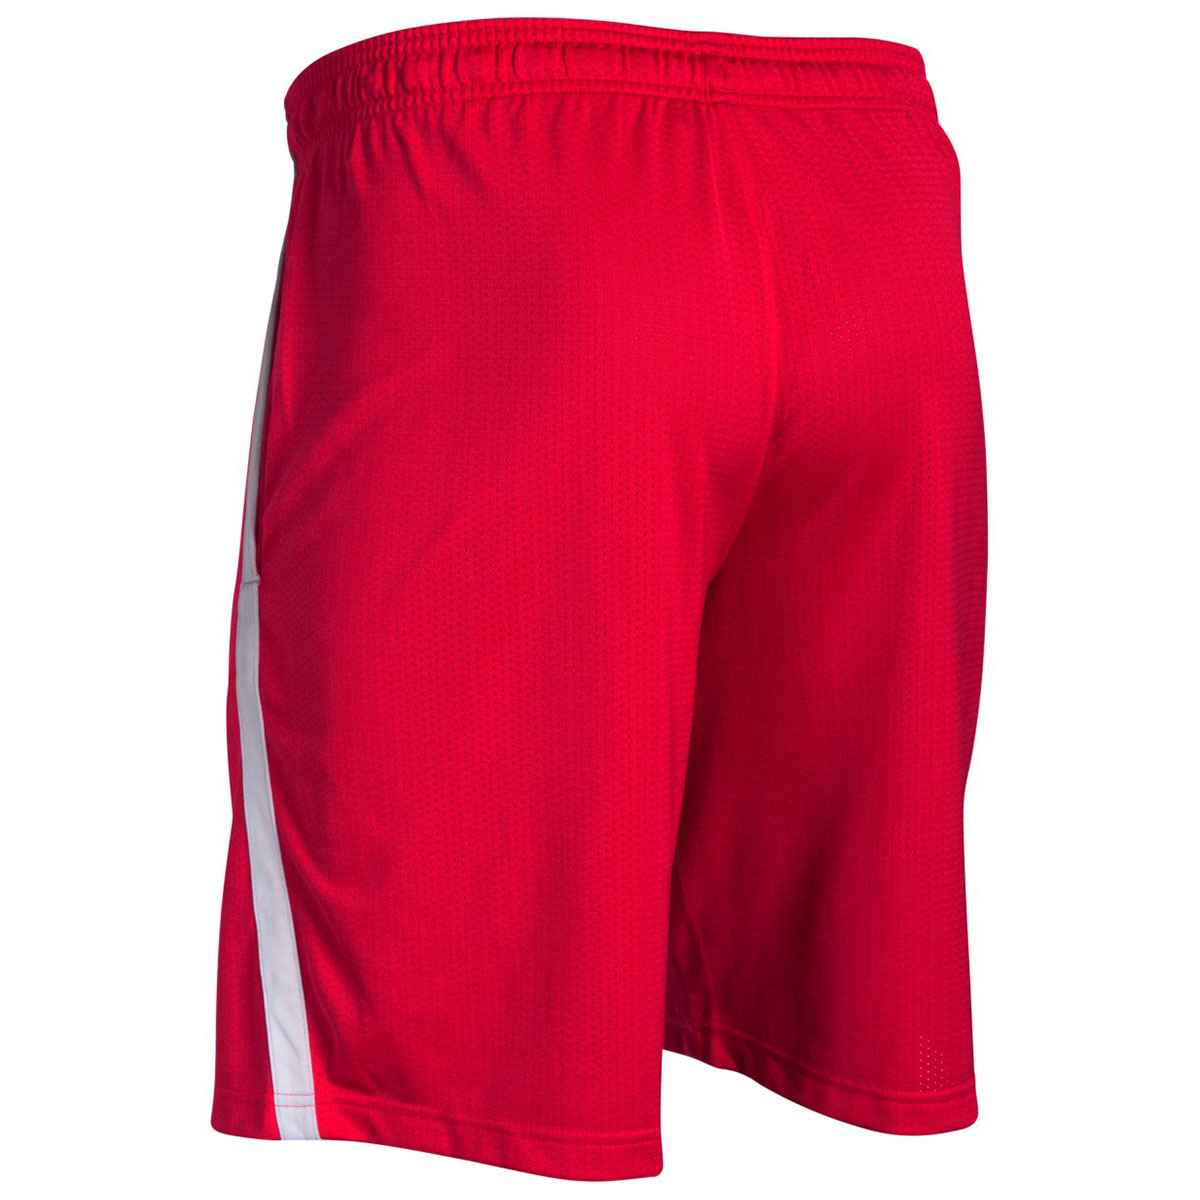 Under-Armour-2017-Mens-UA-Tech-Mesh-Gym-Fitness-Training-Sports-Shorts